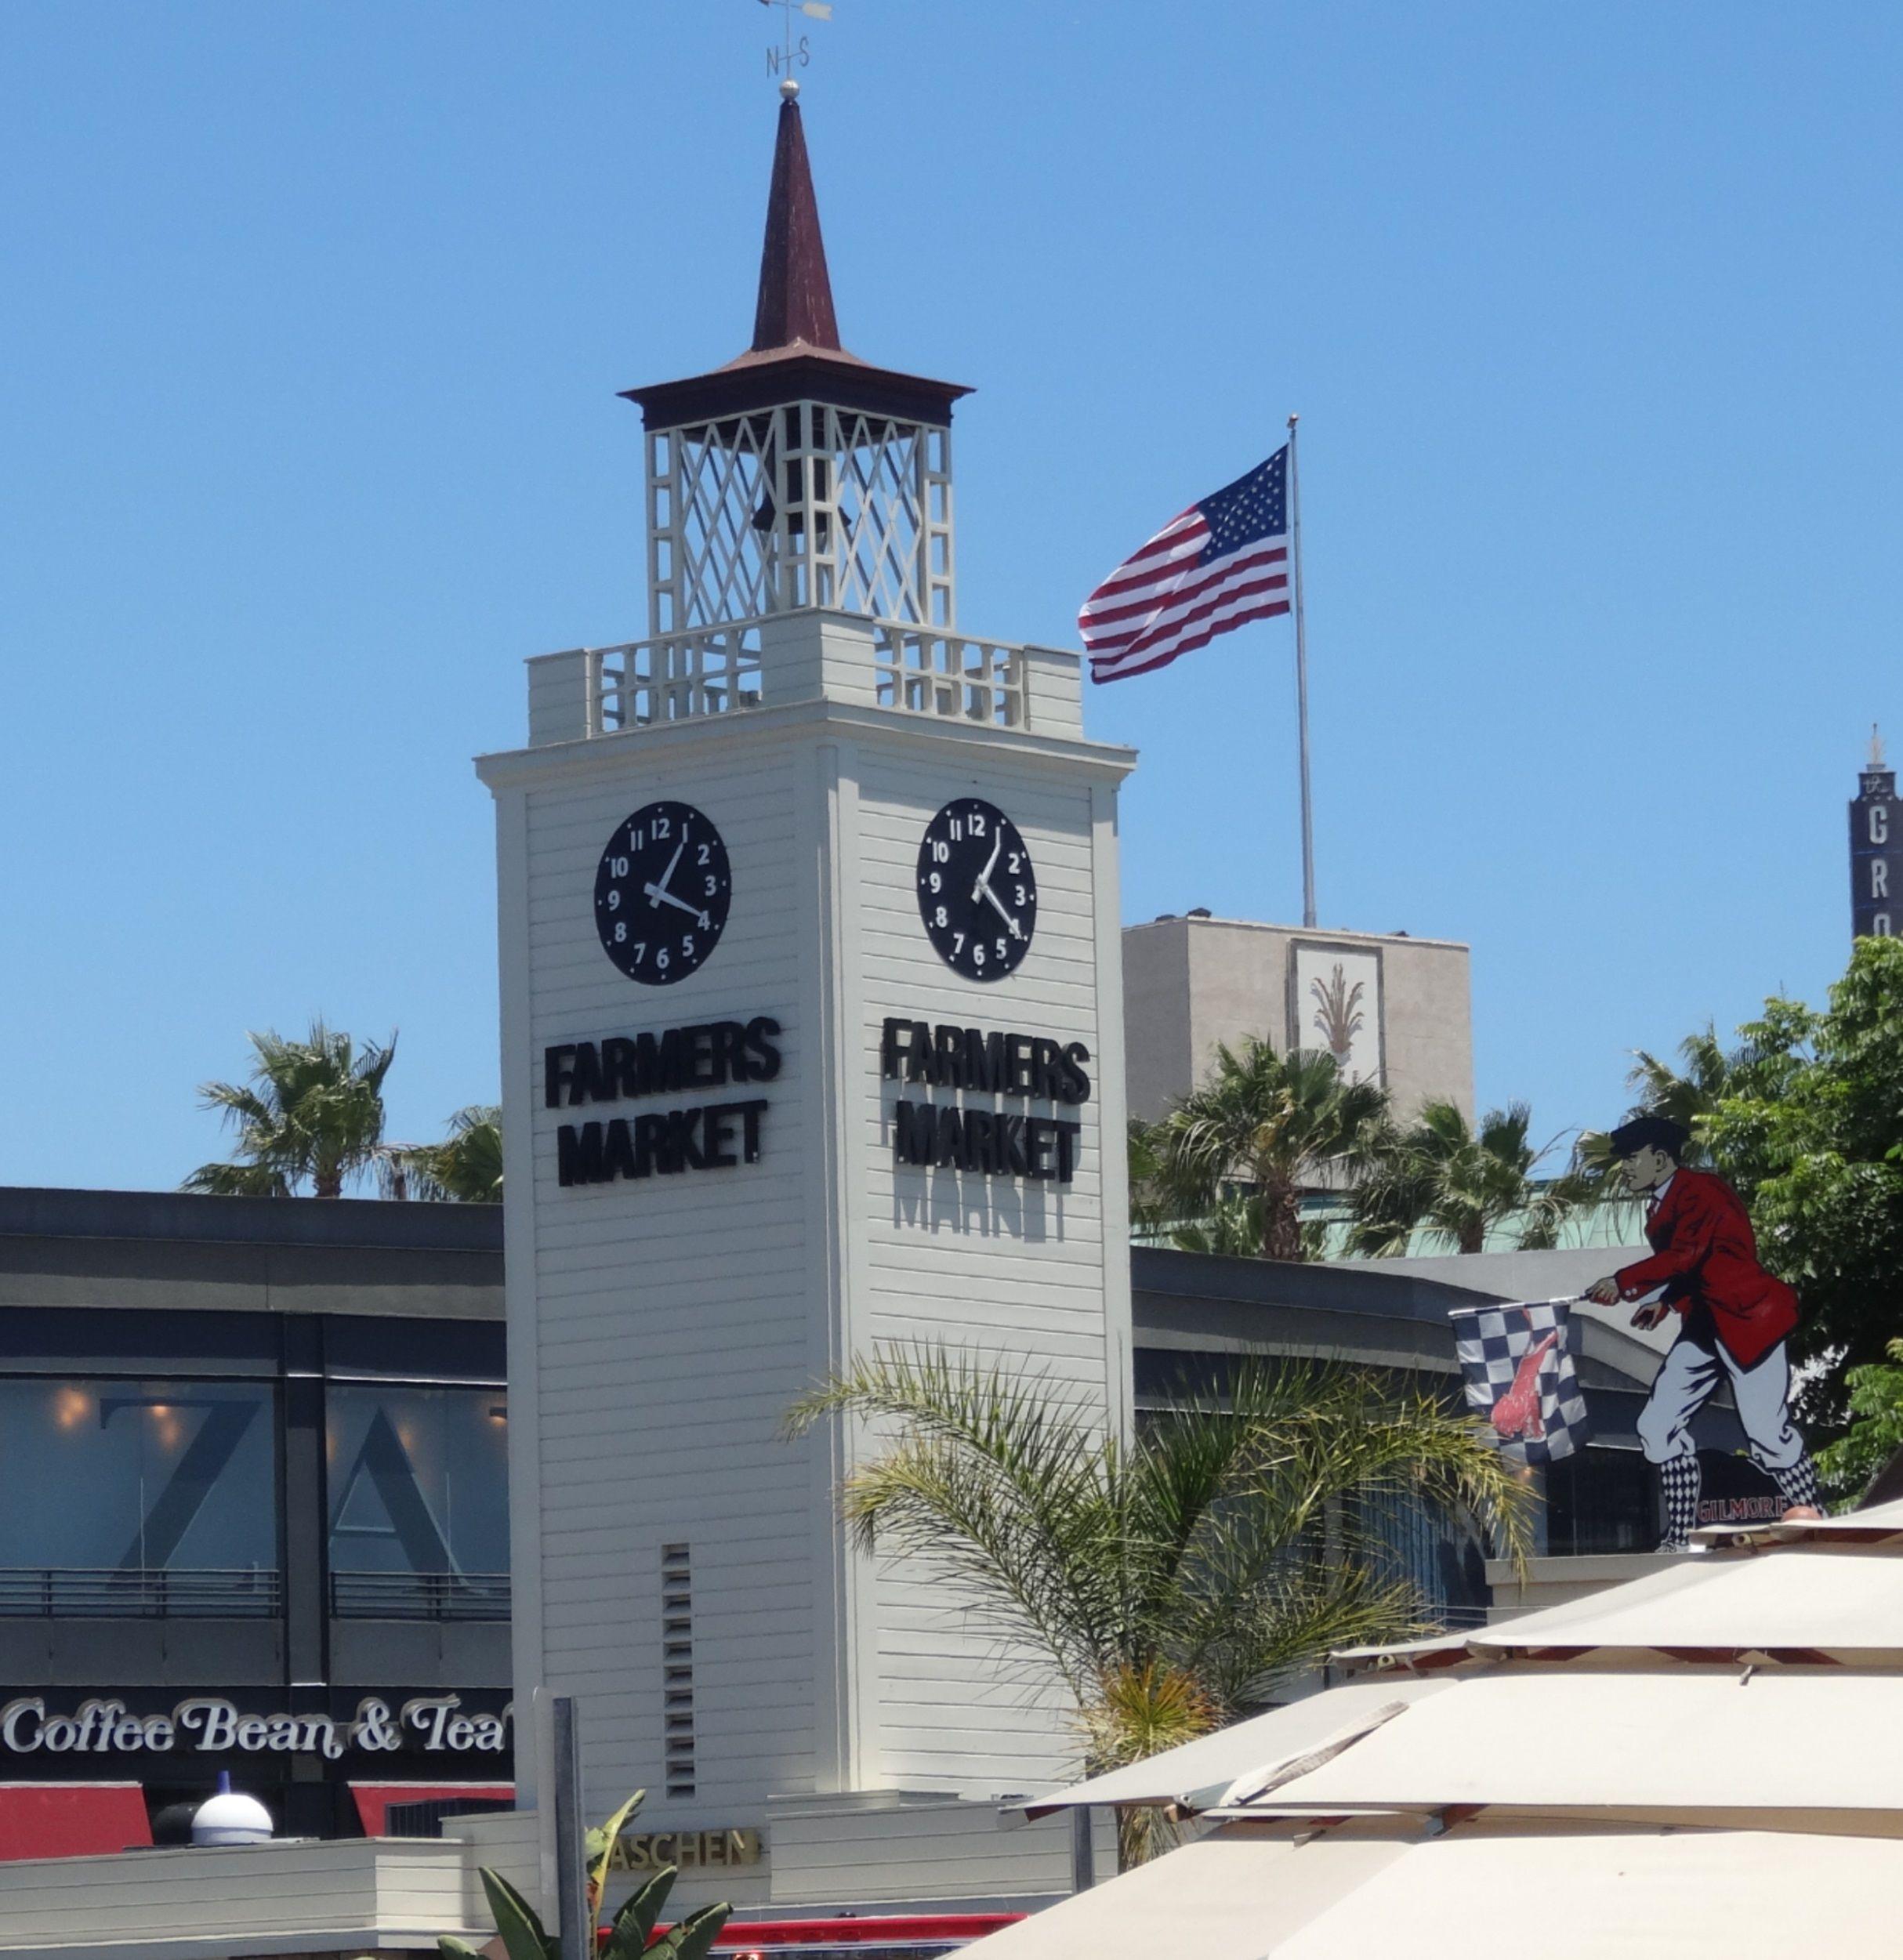 Hollywood, CA.  Farmers Market.  June 28, 2013.  Photo by Rebecca Kjolberg.